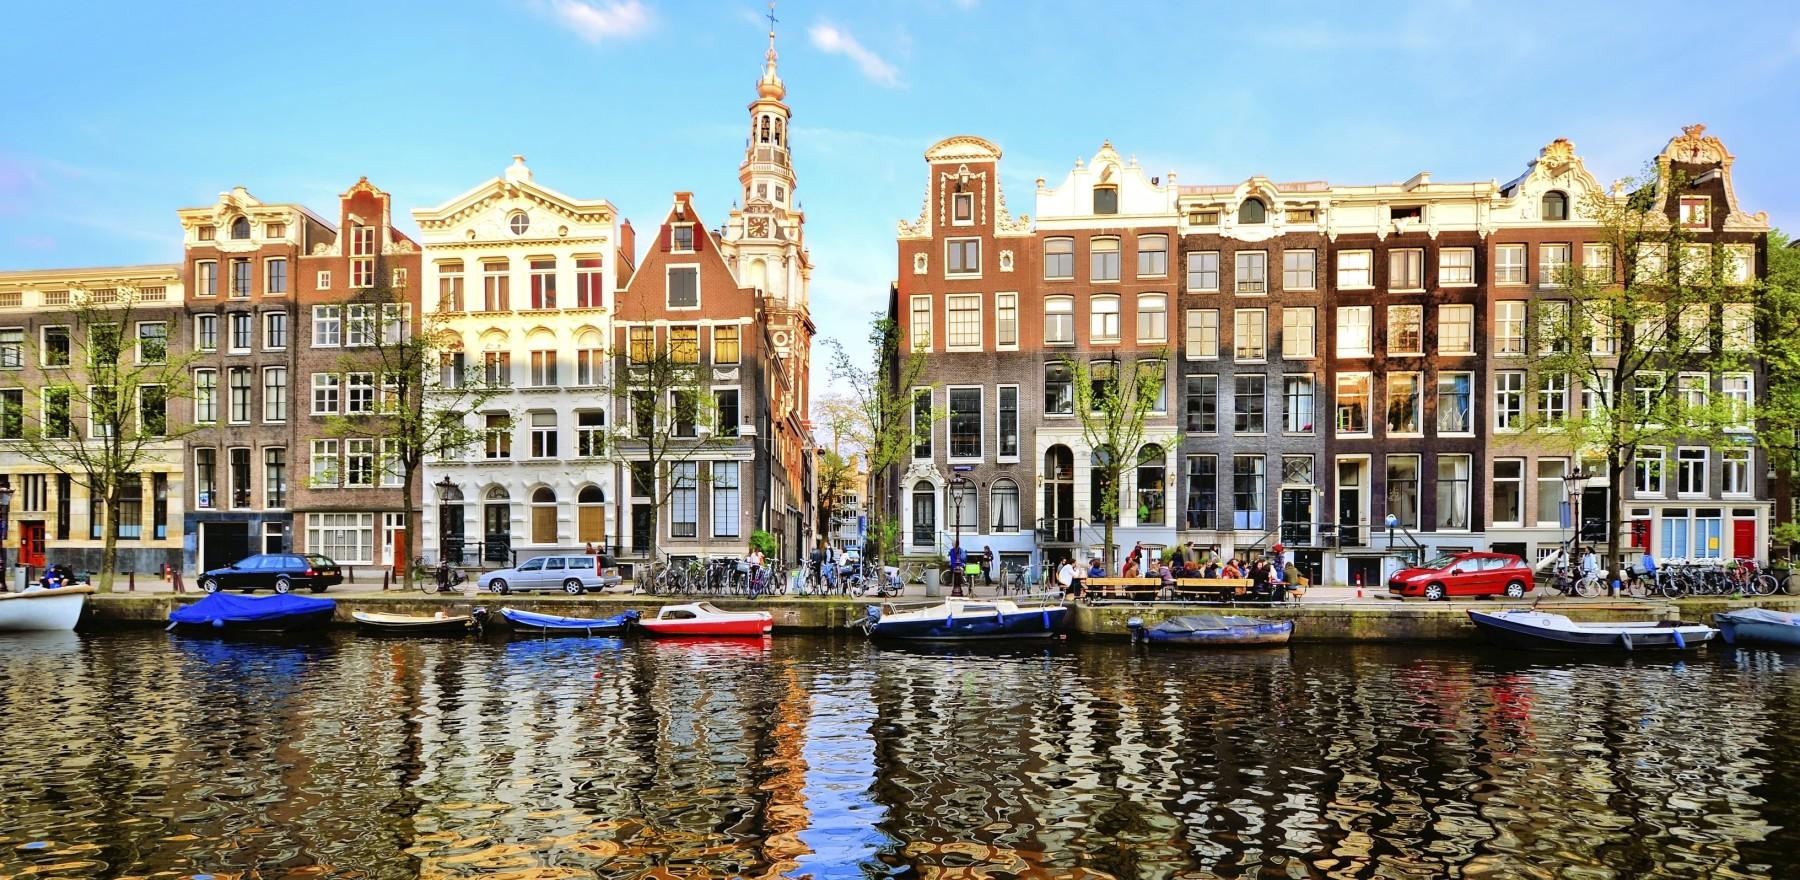 http://temareiser.no/wp-content/uploads/2015/05/Amsterdam-e1435053011300.jpg